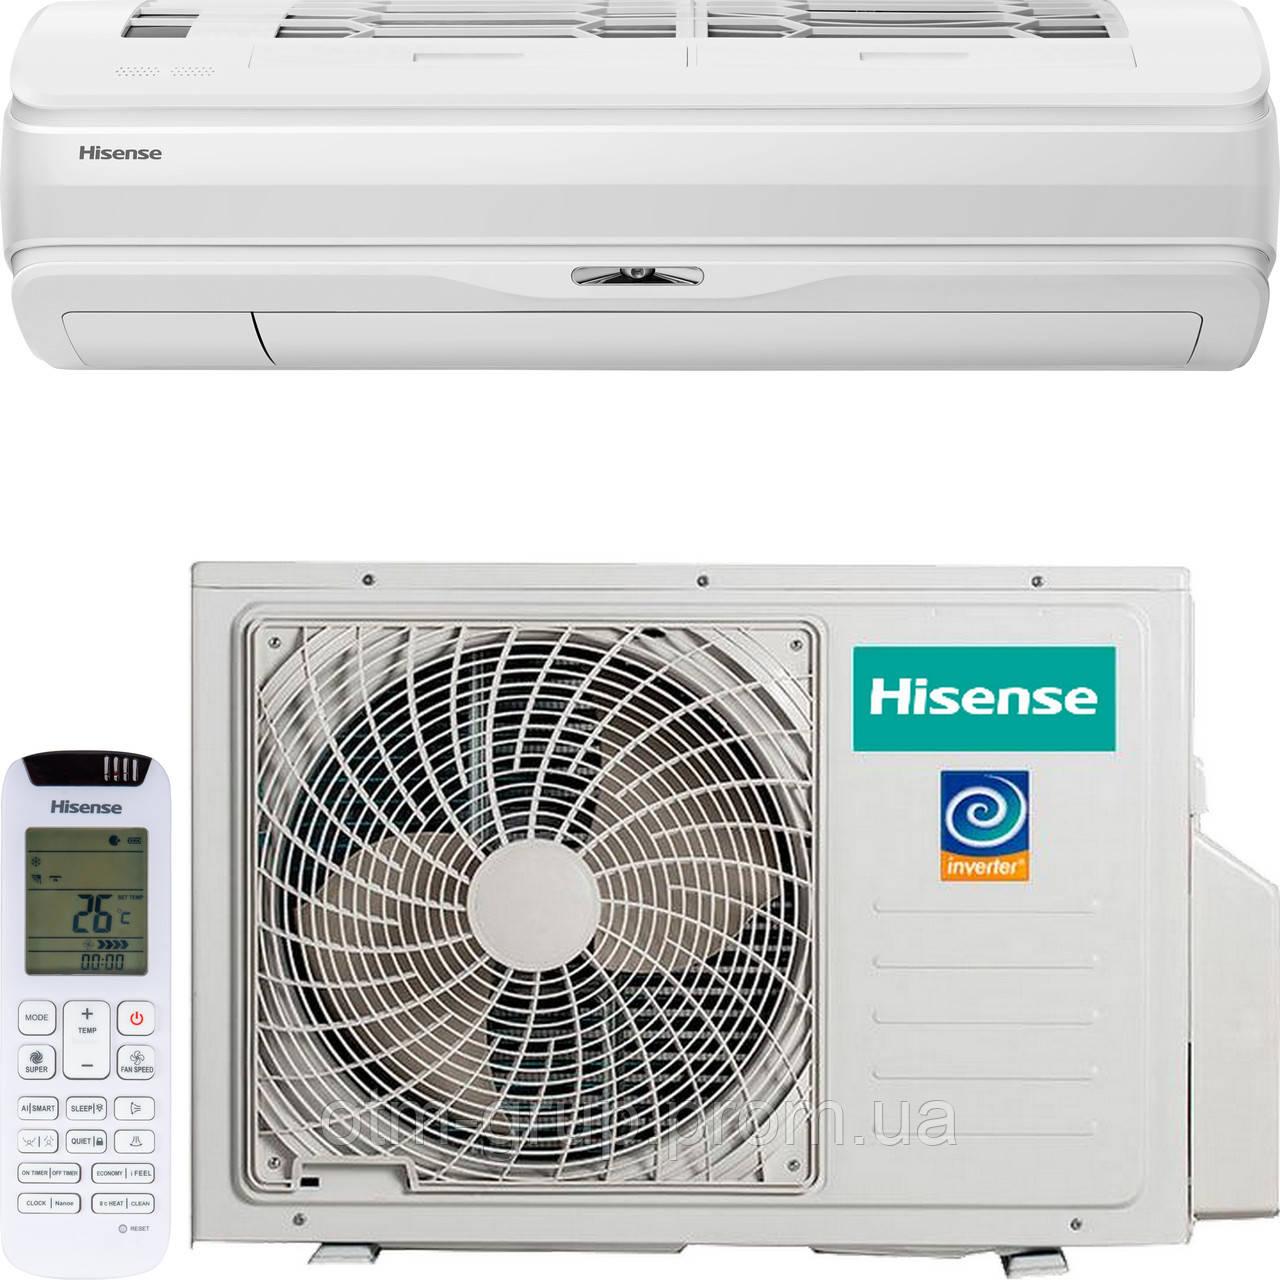 Hisense Silentium Pro QD25XU0A